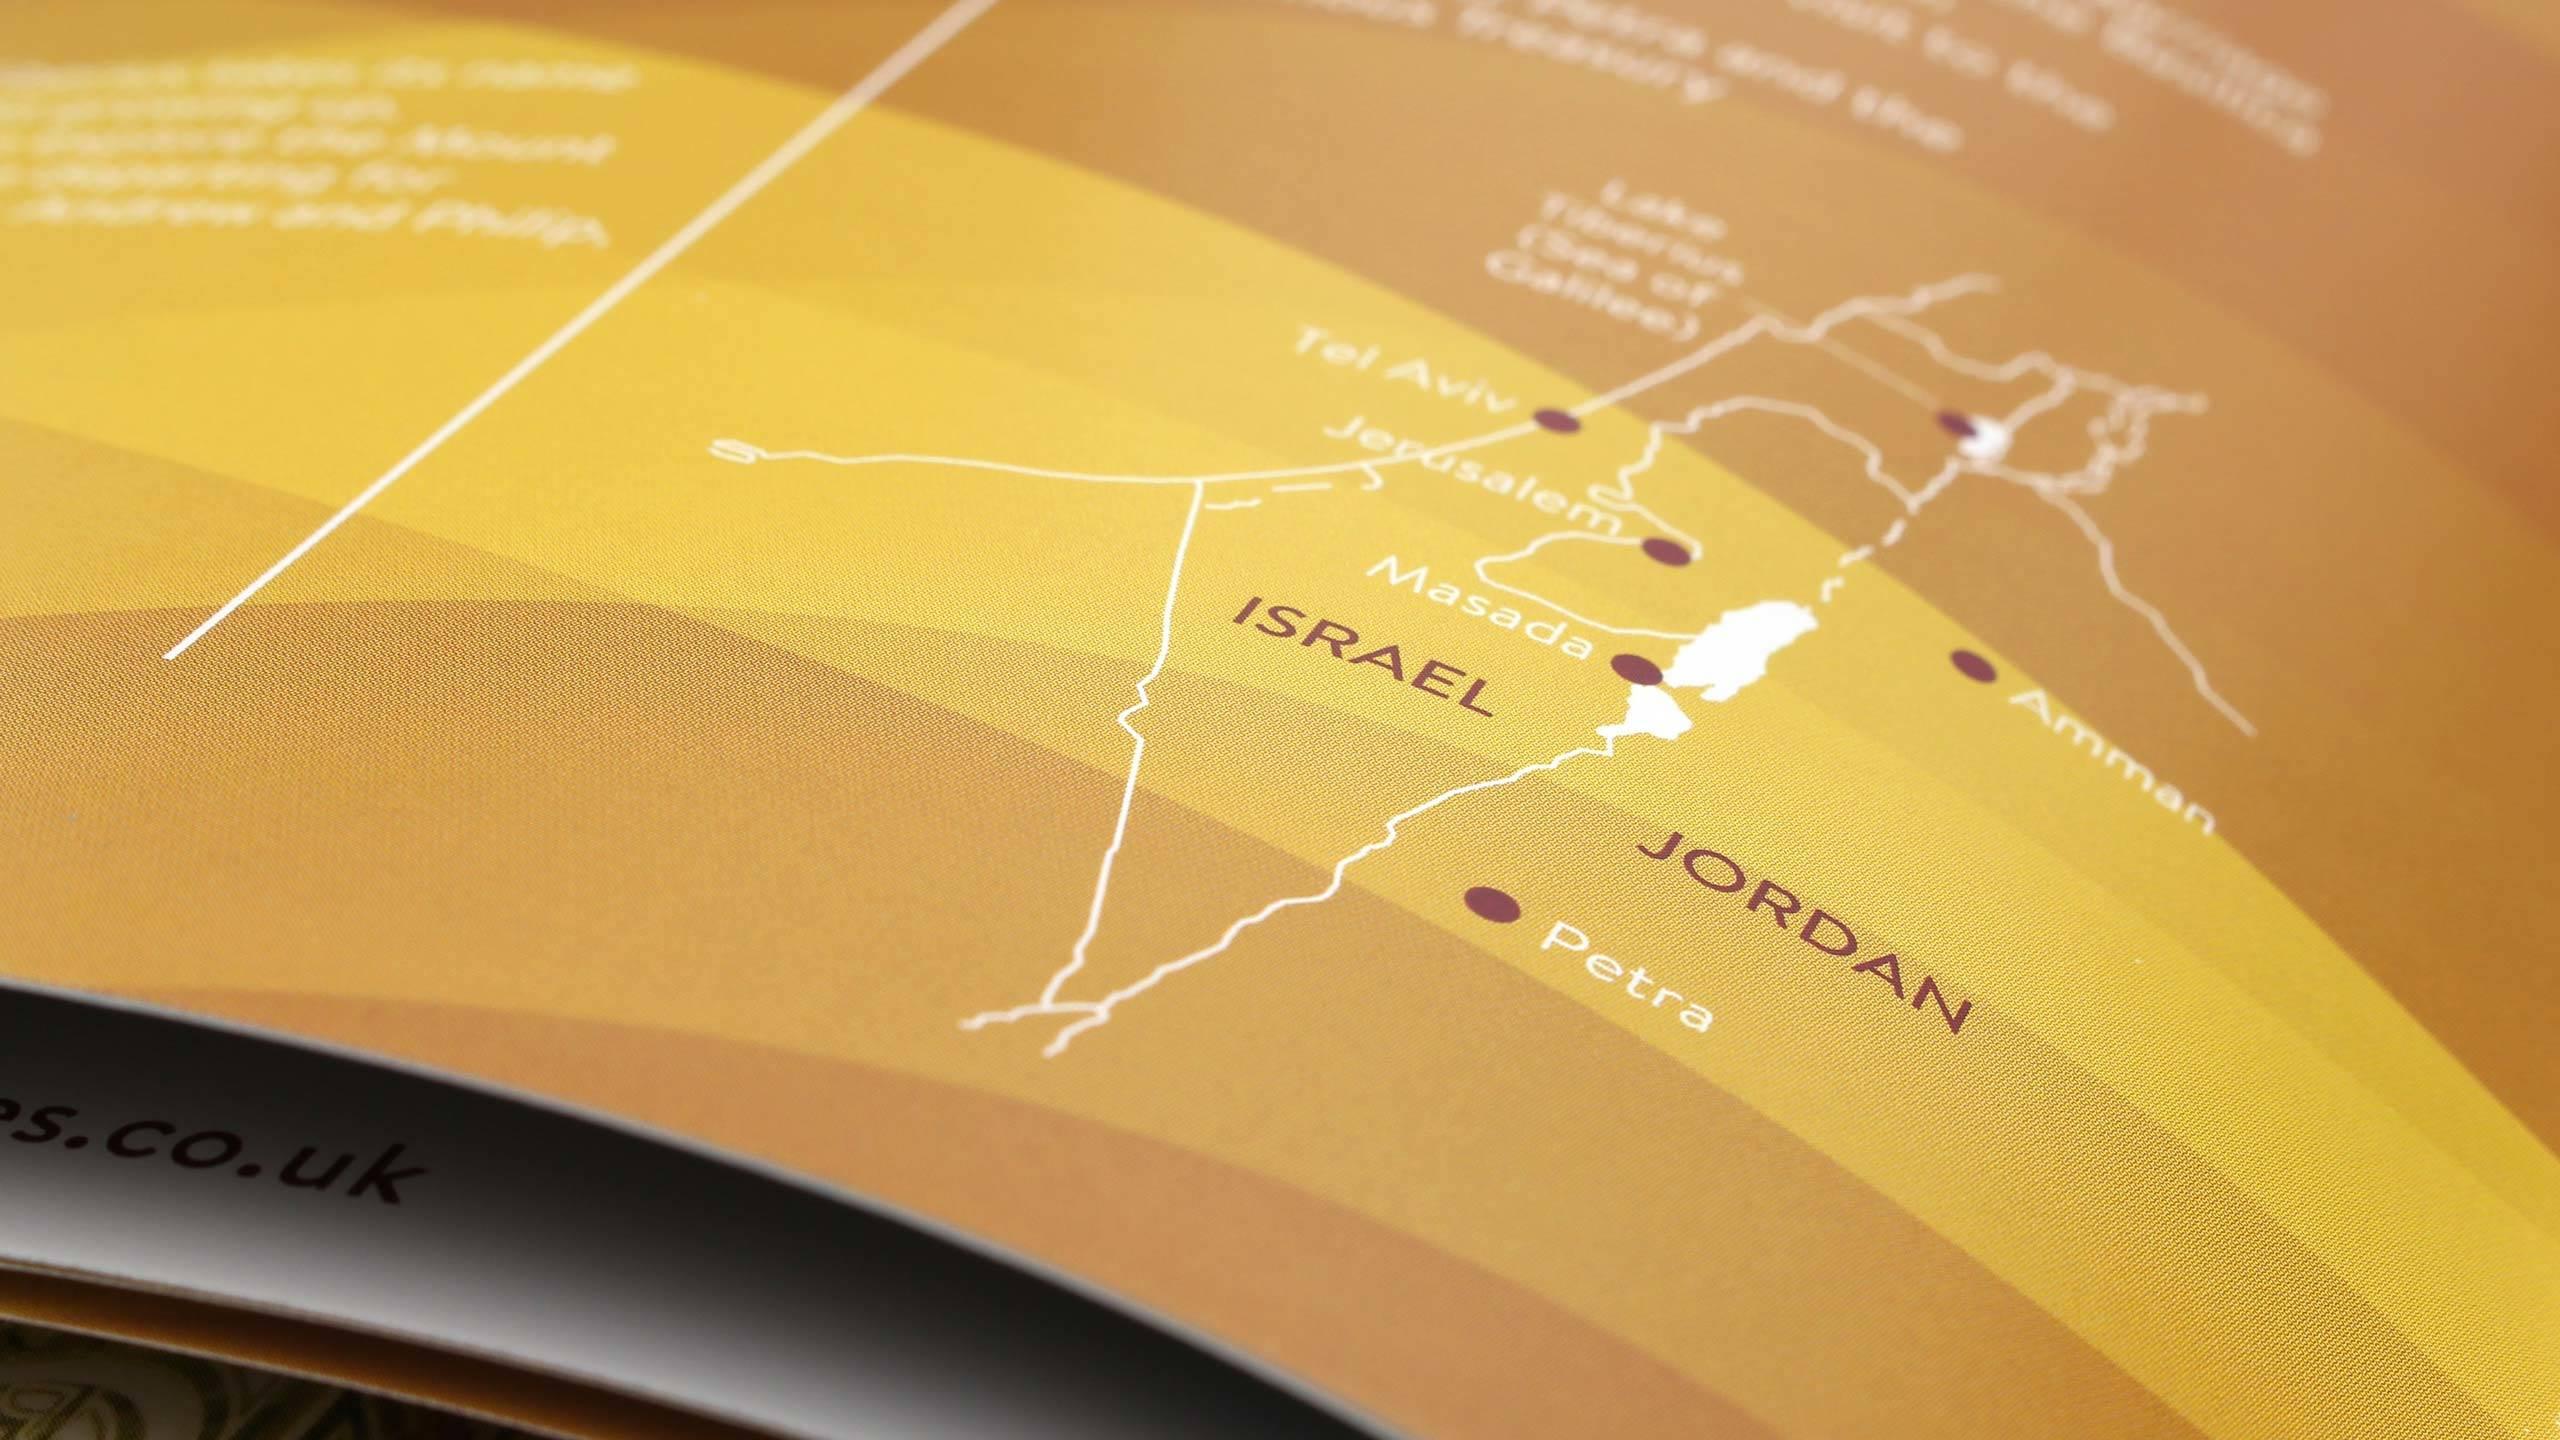 Tours for Churches map closeup